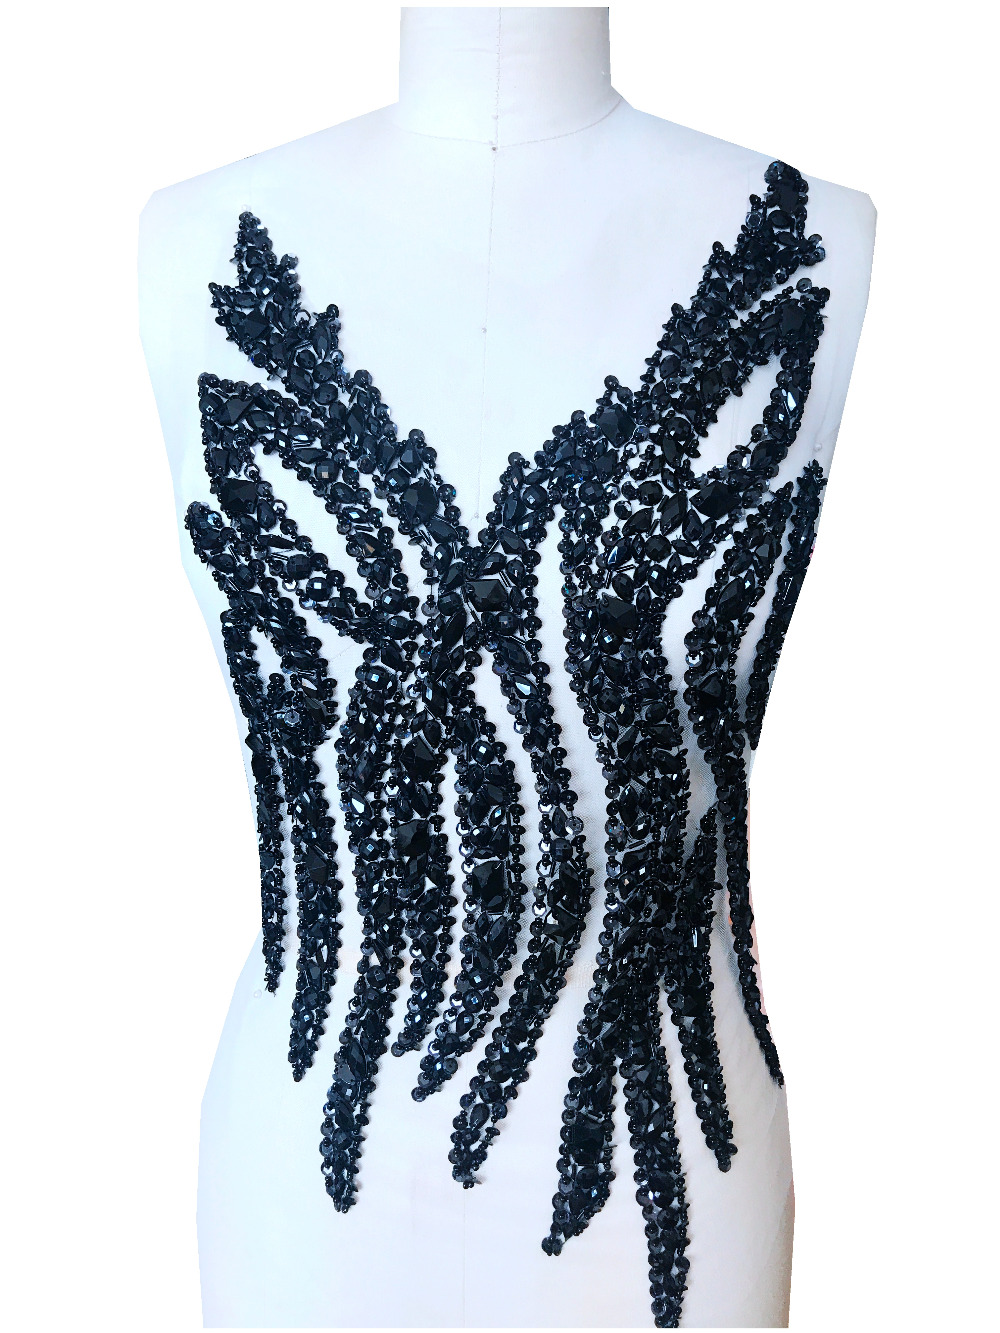 Sequin Applique Exquisite Handmade Sew on Rhinestone Applique Beaded Applique By The Piece Prom Dress Patch Applique